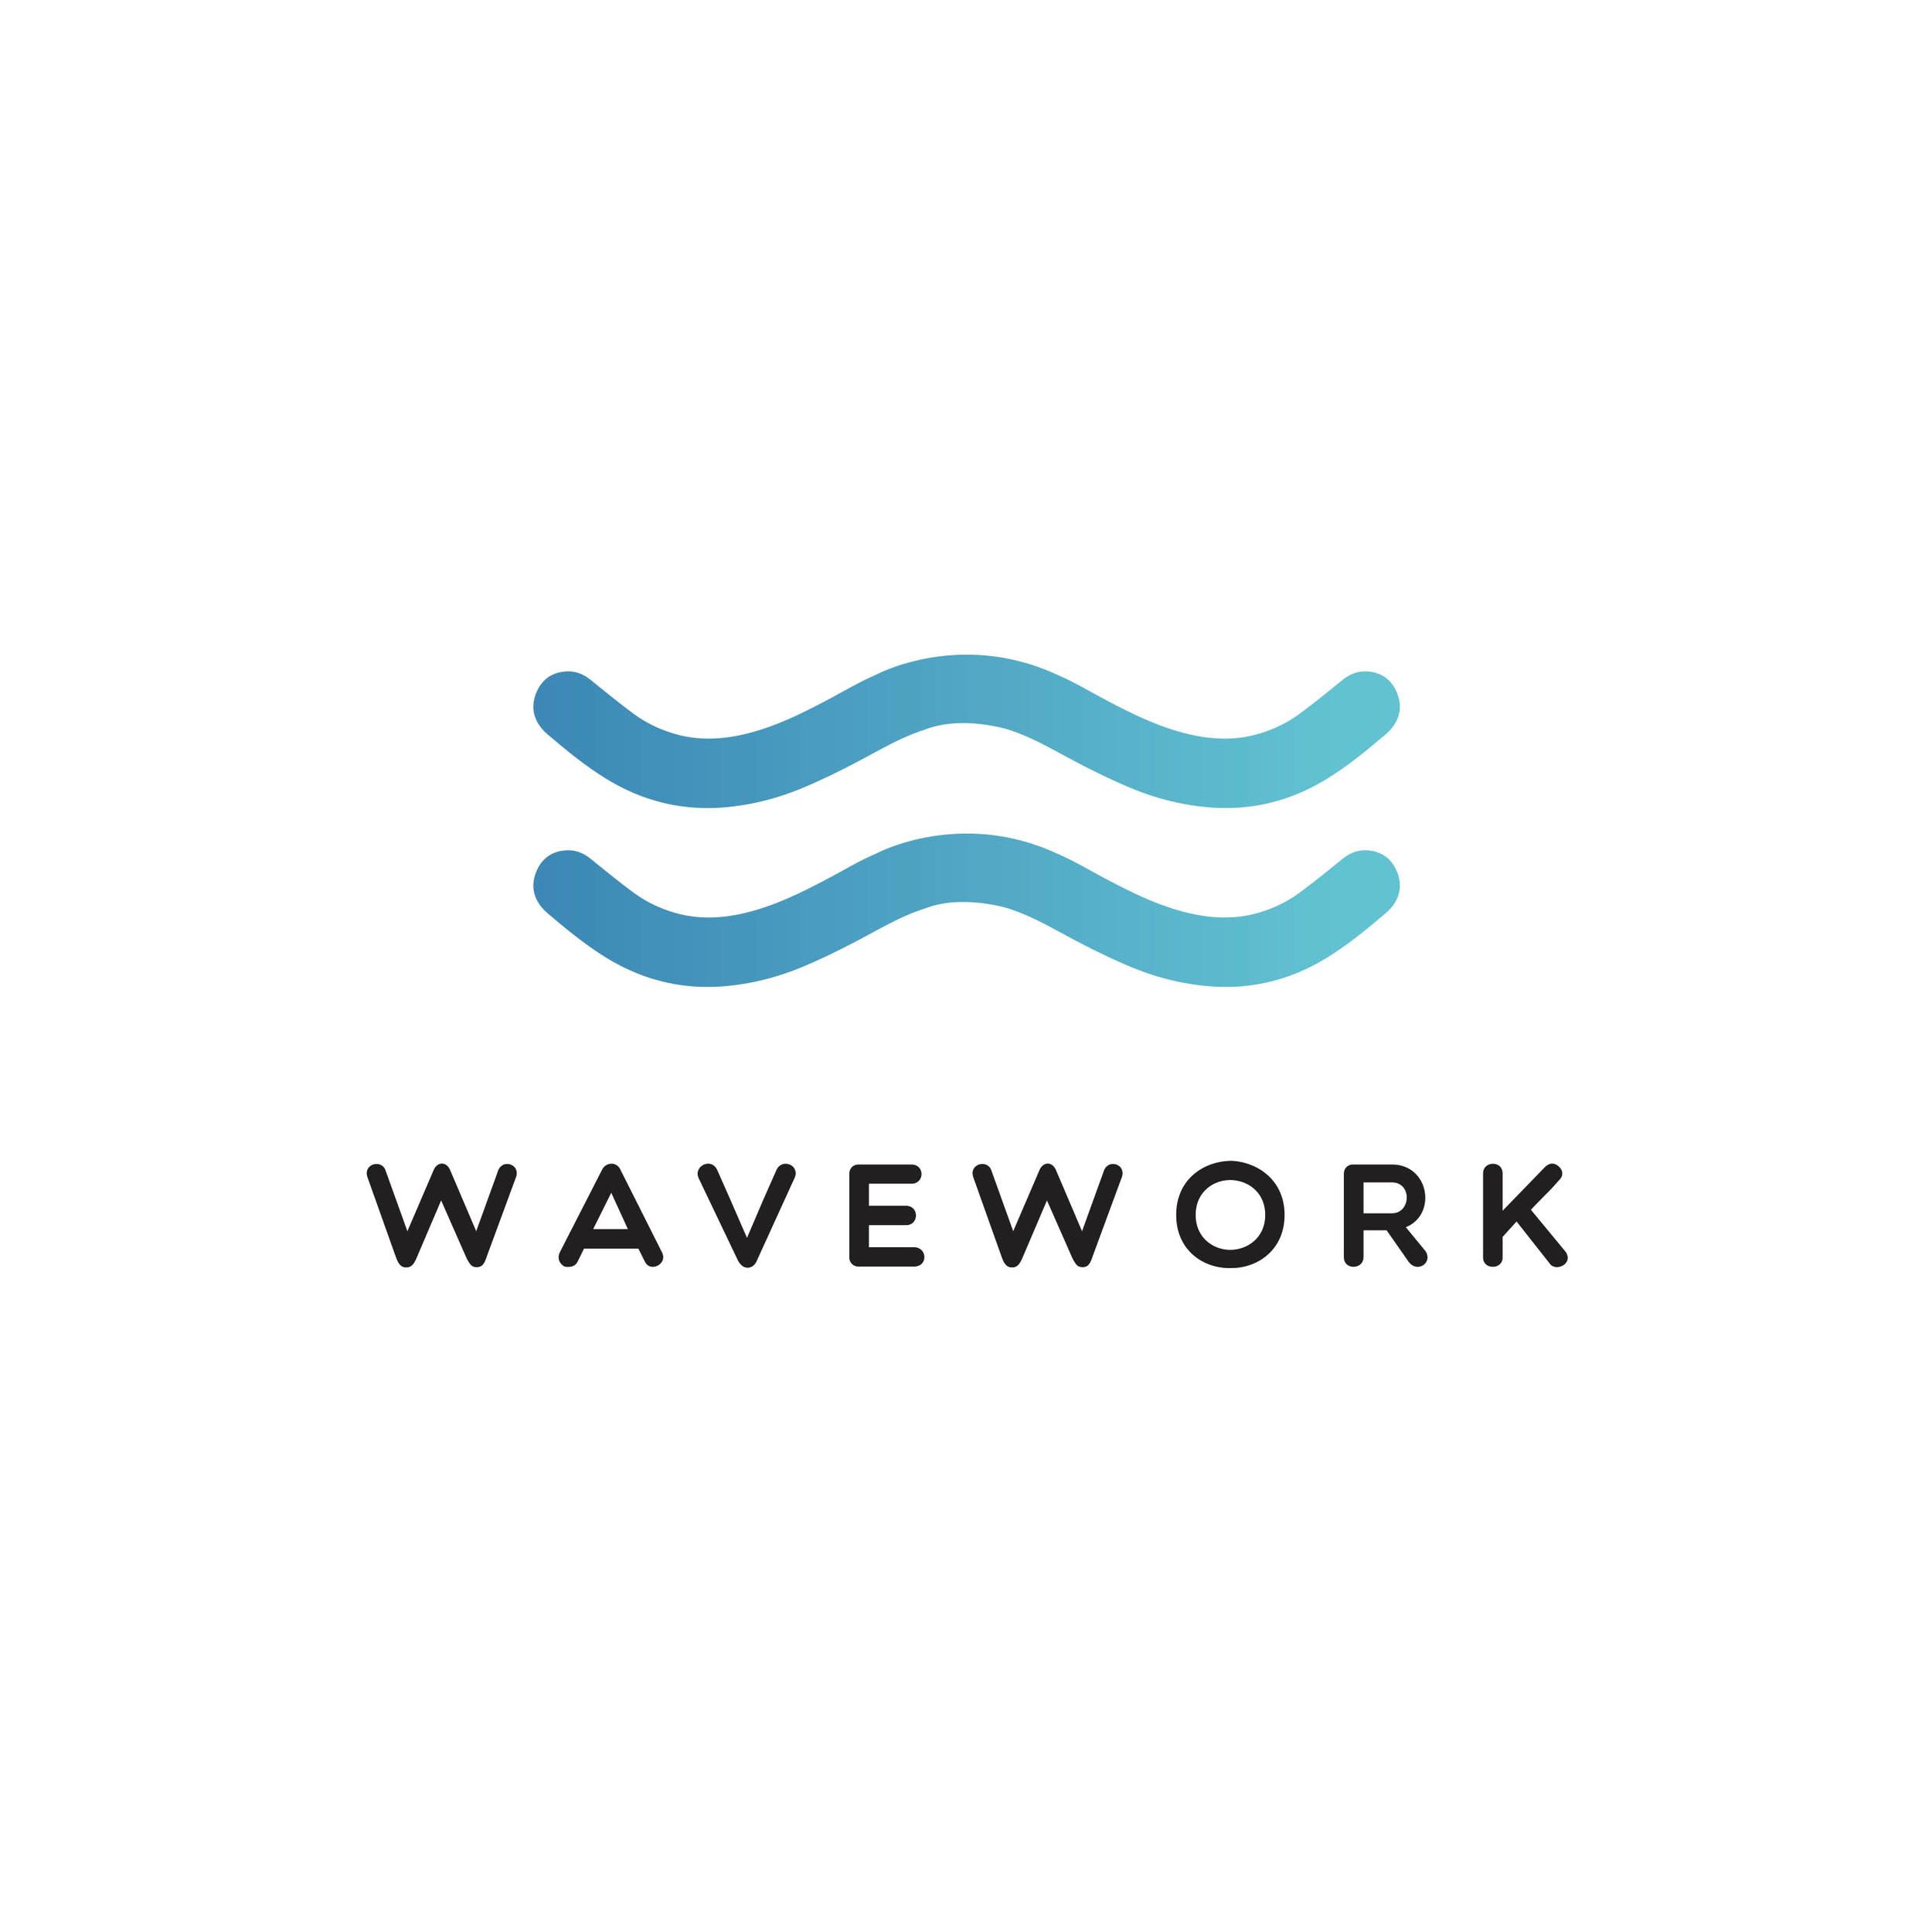 Wavework_White_Double_Wave.jpg